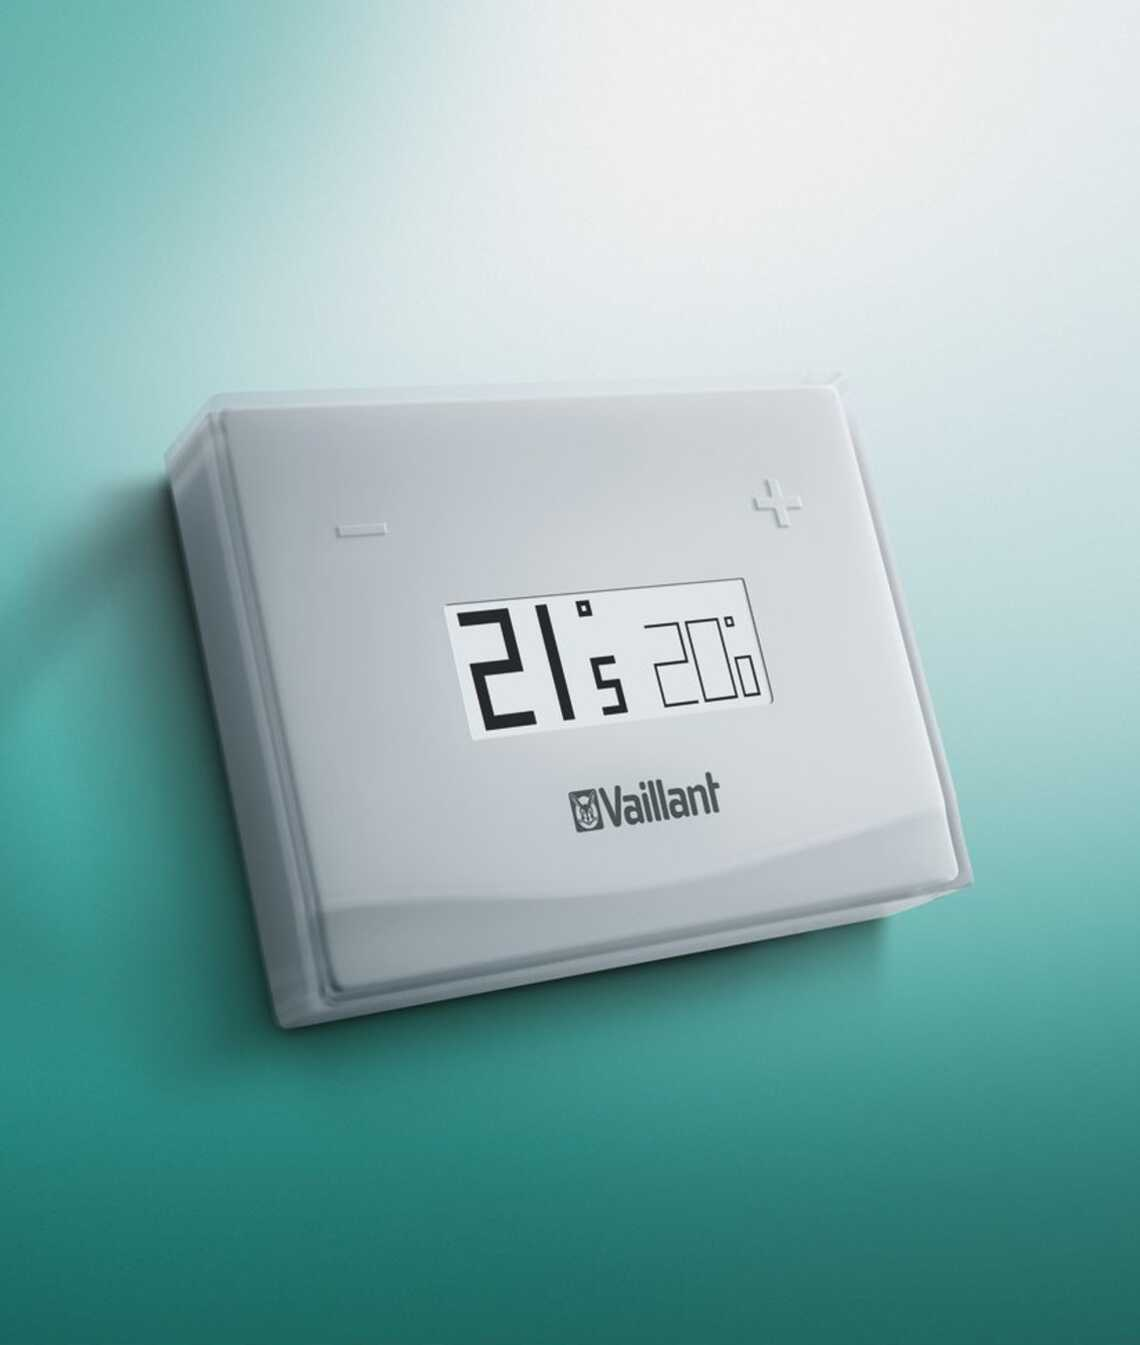 vSMART | Smart Heating | Vaillant UK